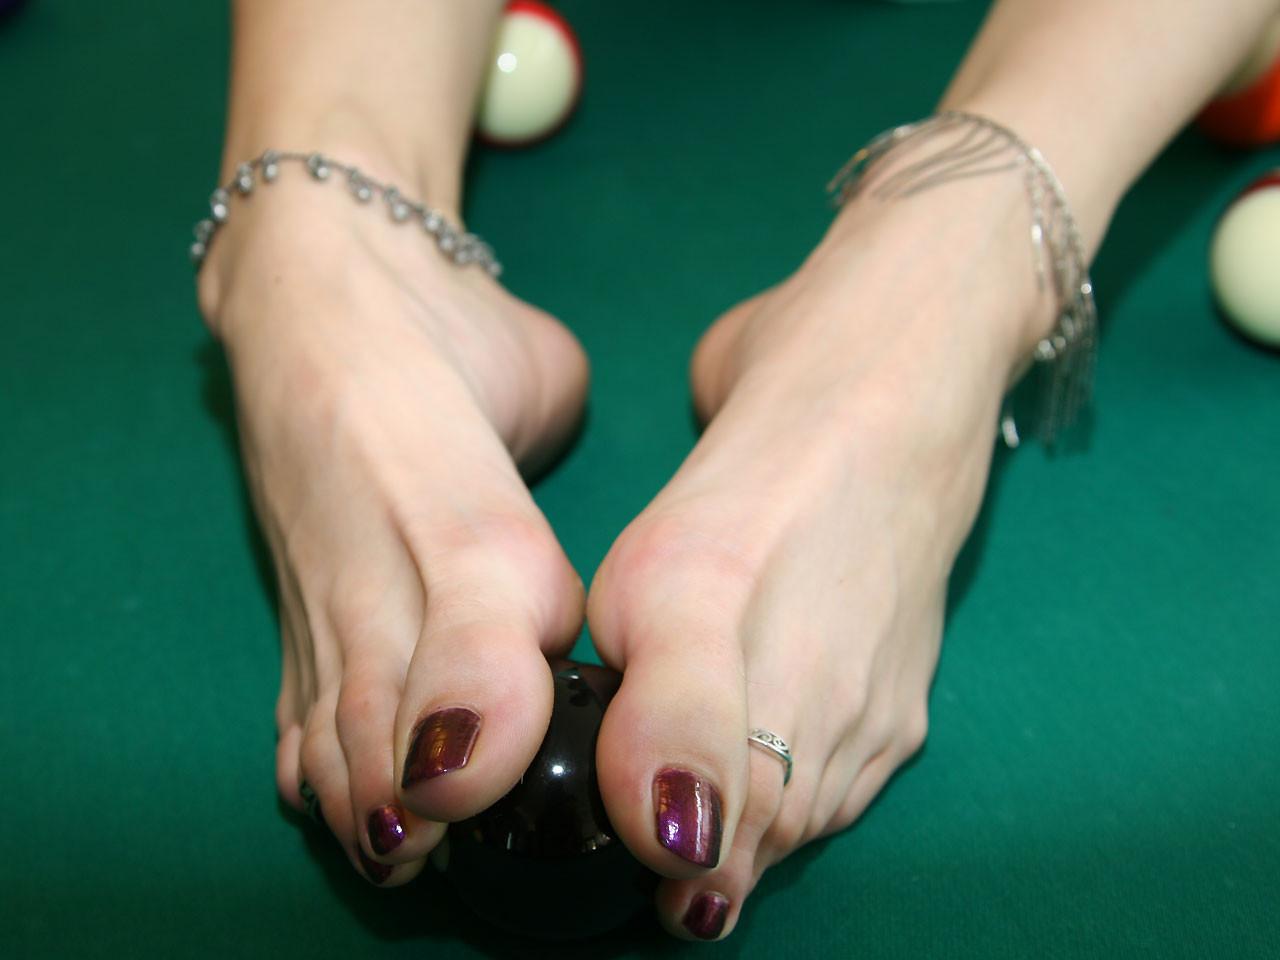 juicy feet